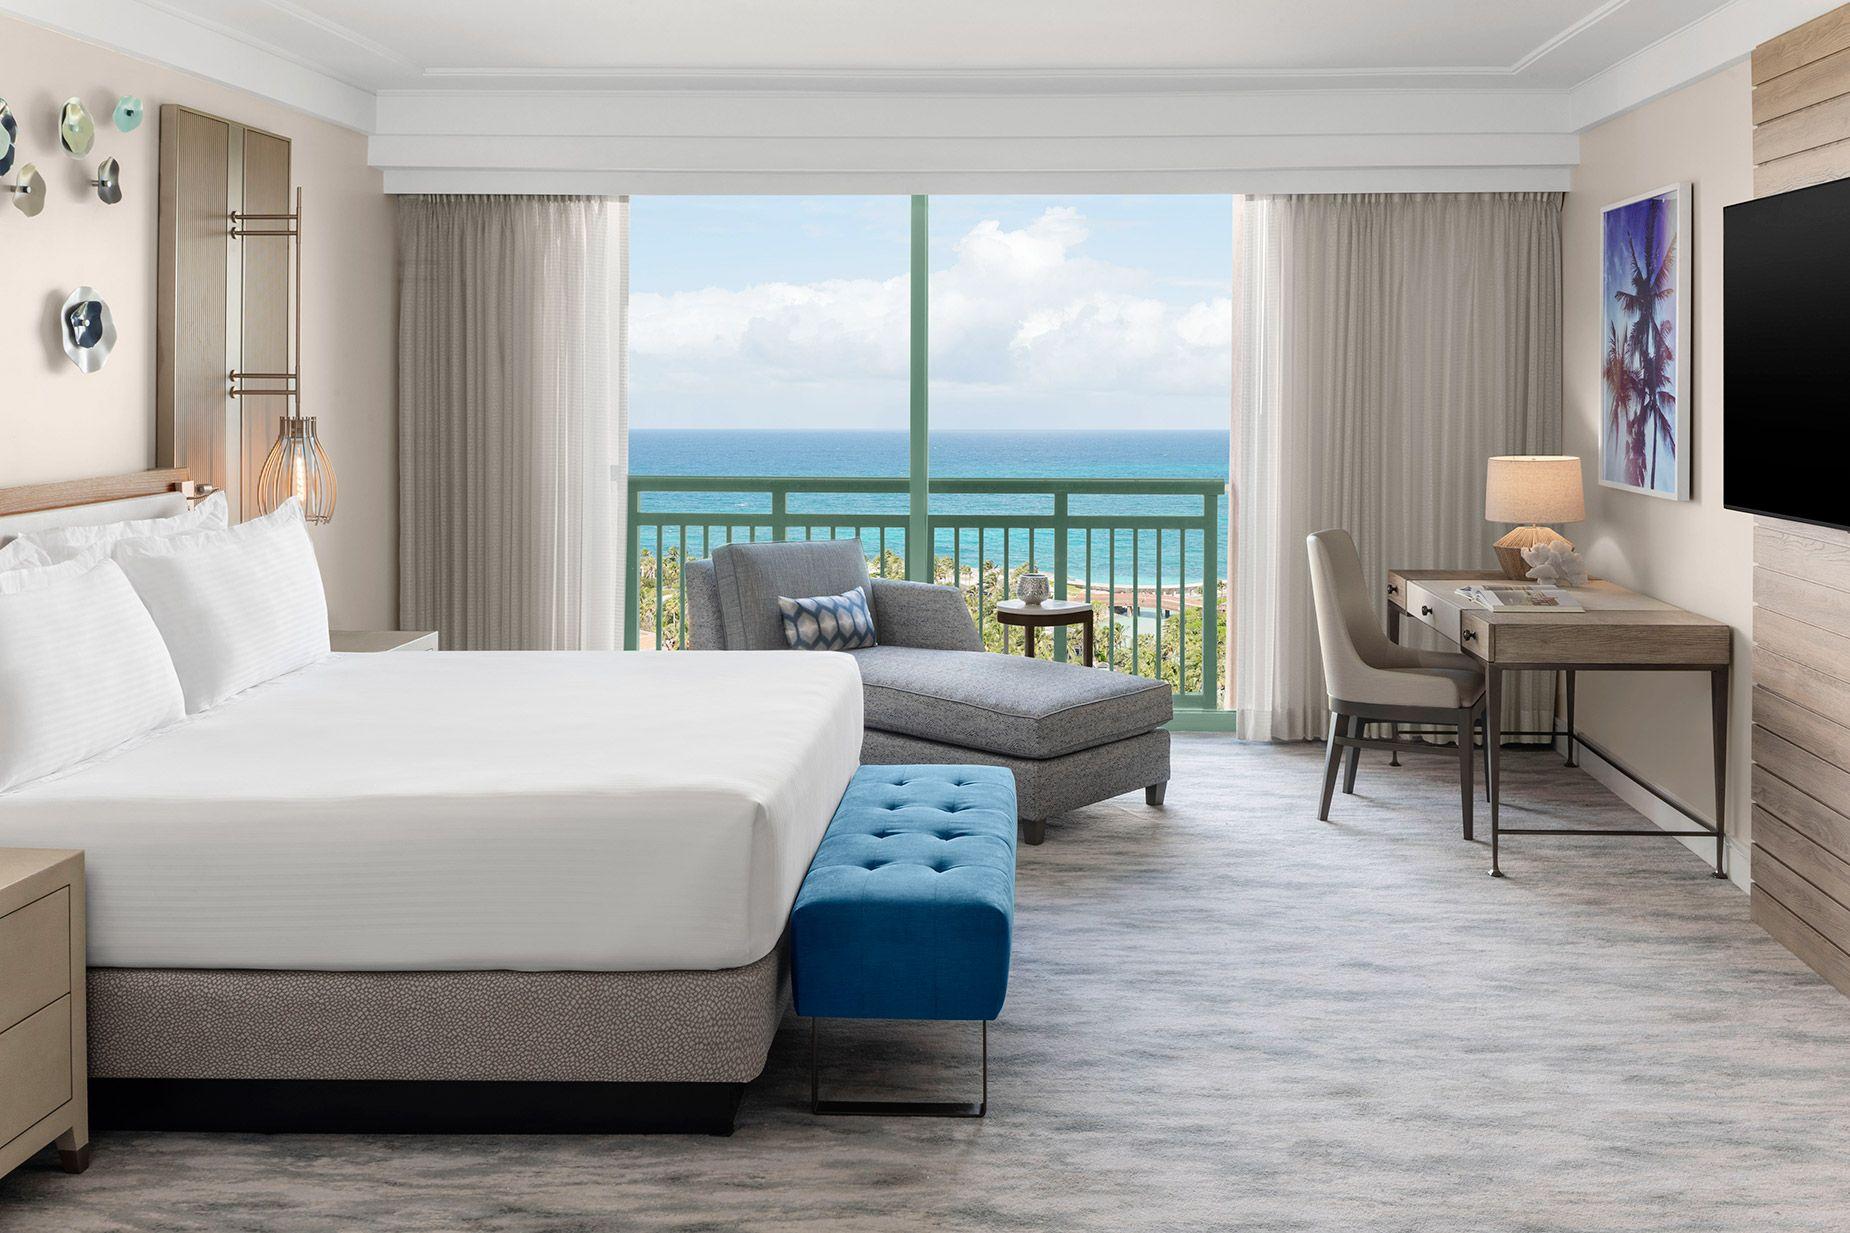 AK_NASAK_Royal_Grand_Suite_Bedroom_001.jpg